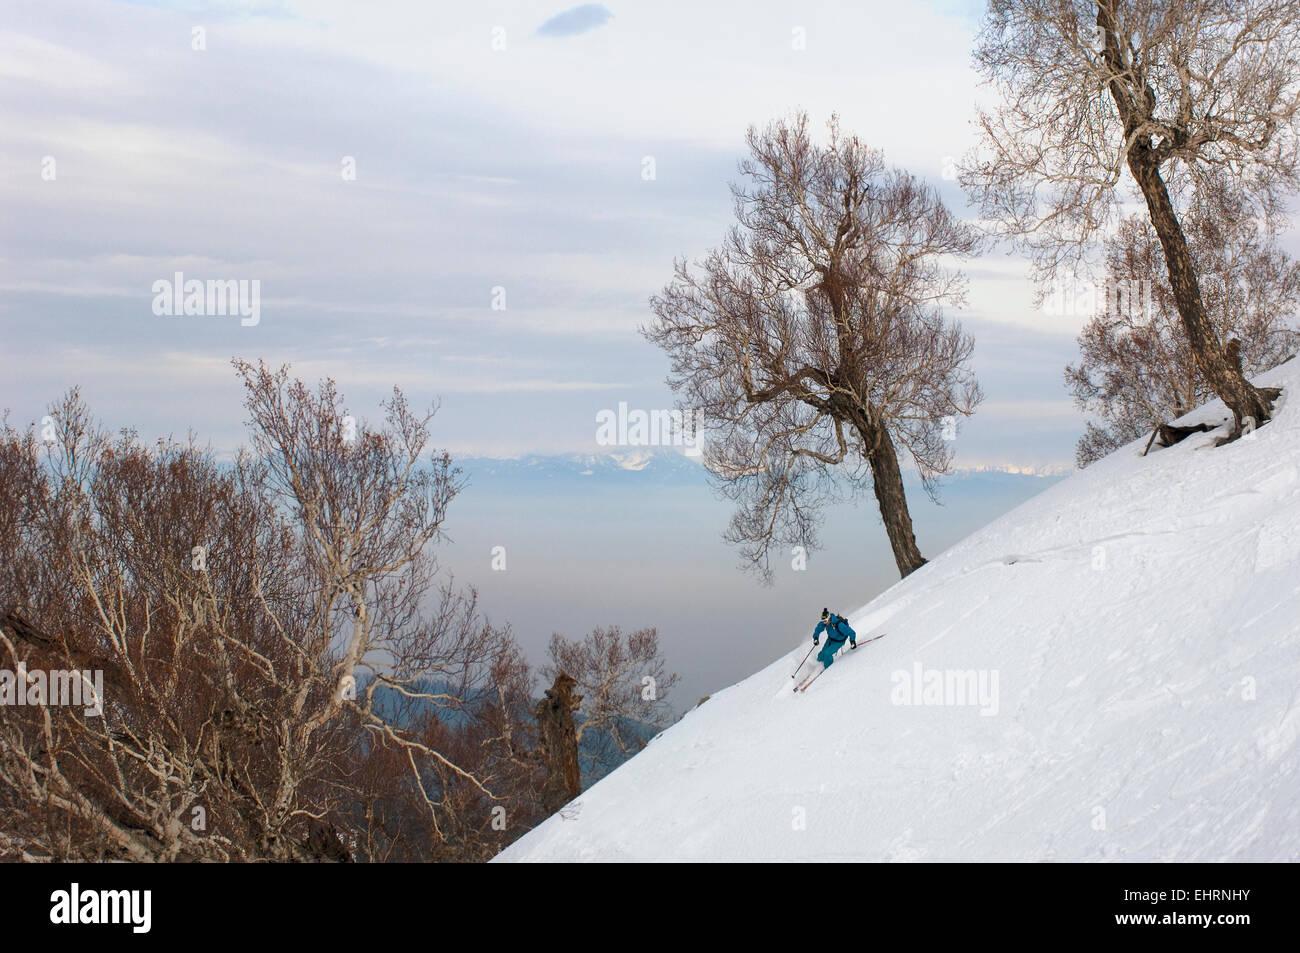 skier skis off-piste in gulmarg ski resort, mt apharwat, kashmir